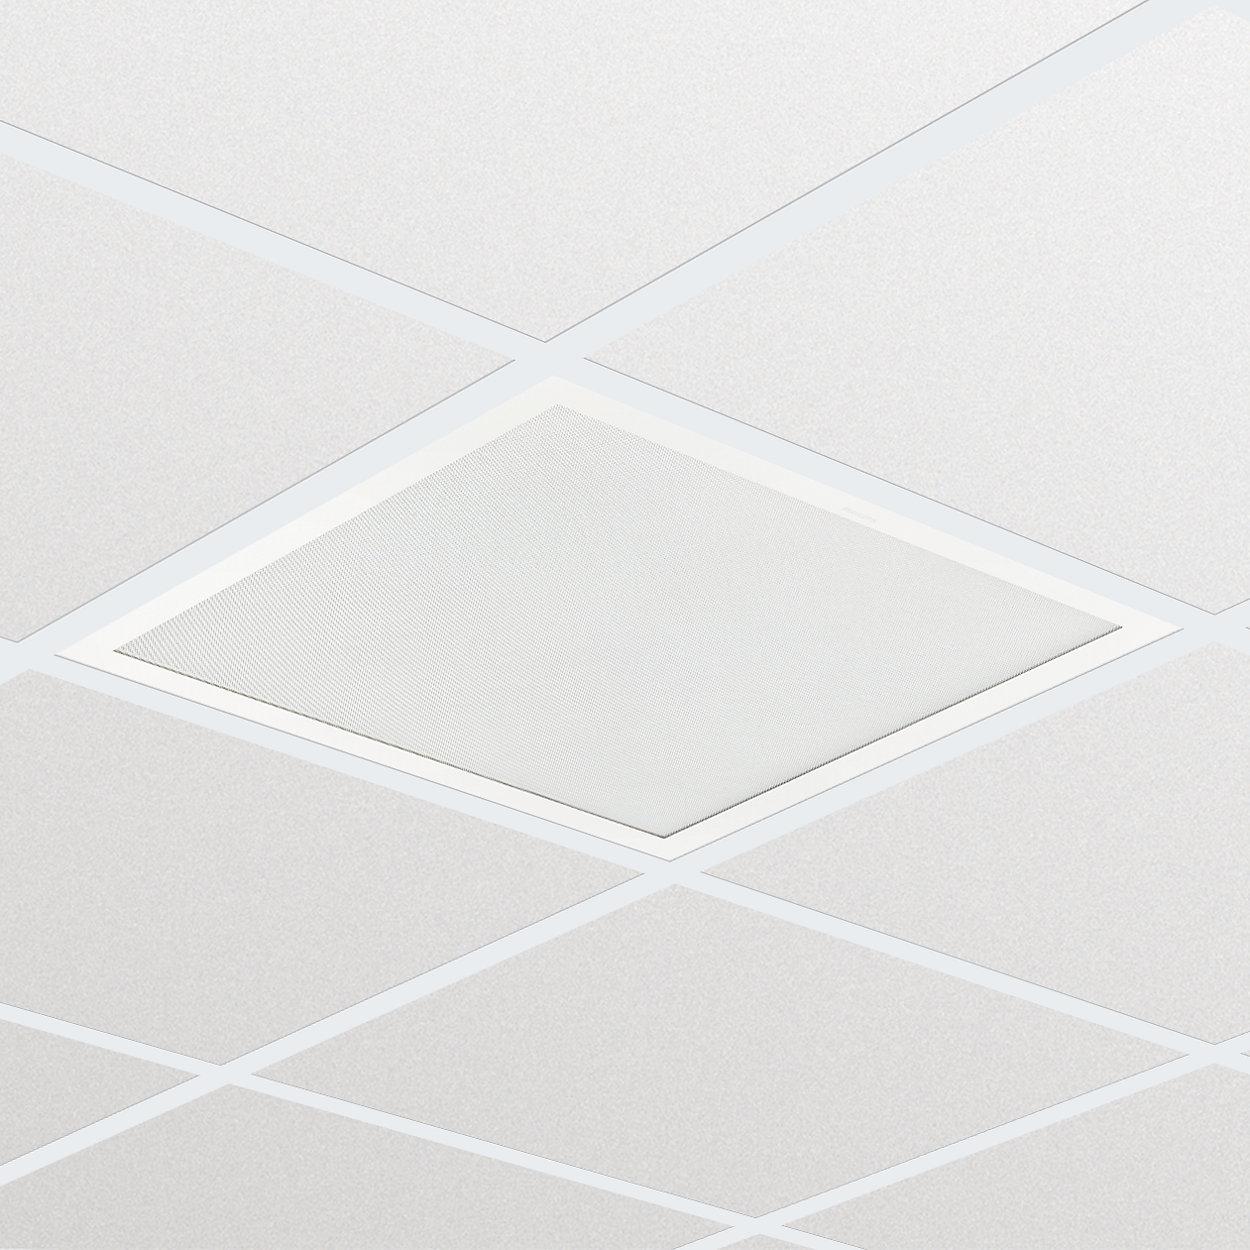 Ledinaire Panel - Simply great LED